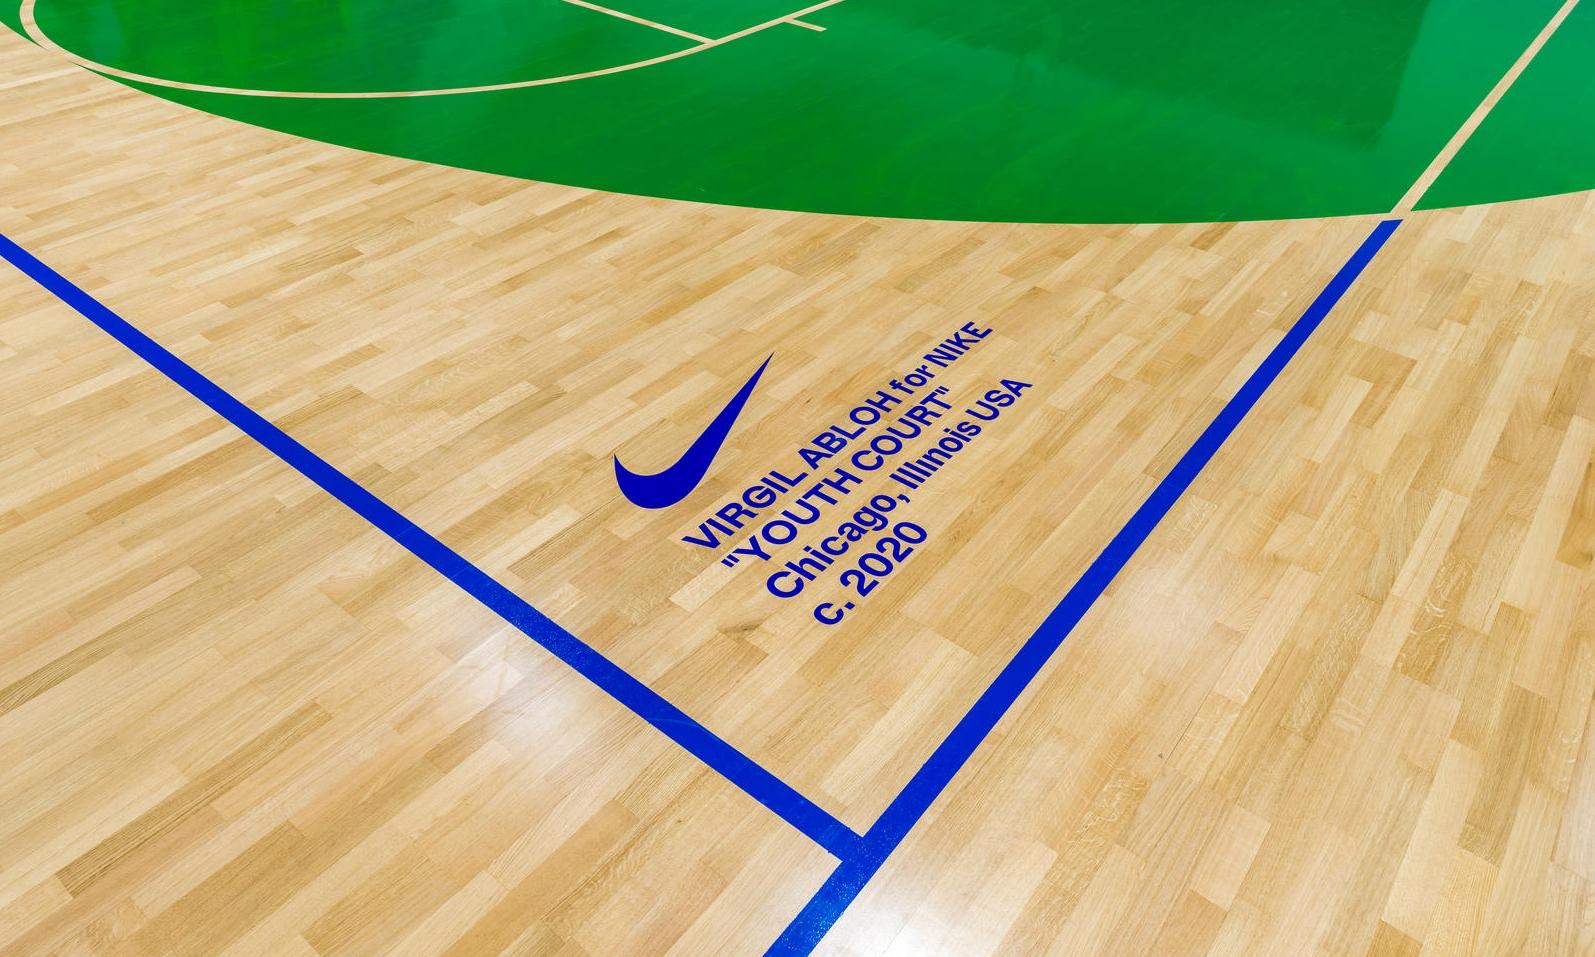 Nike 携手 Virgil Abloh 为芝加哥 Boys & Girls 俱乐部设计主题篮球场